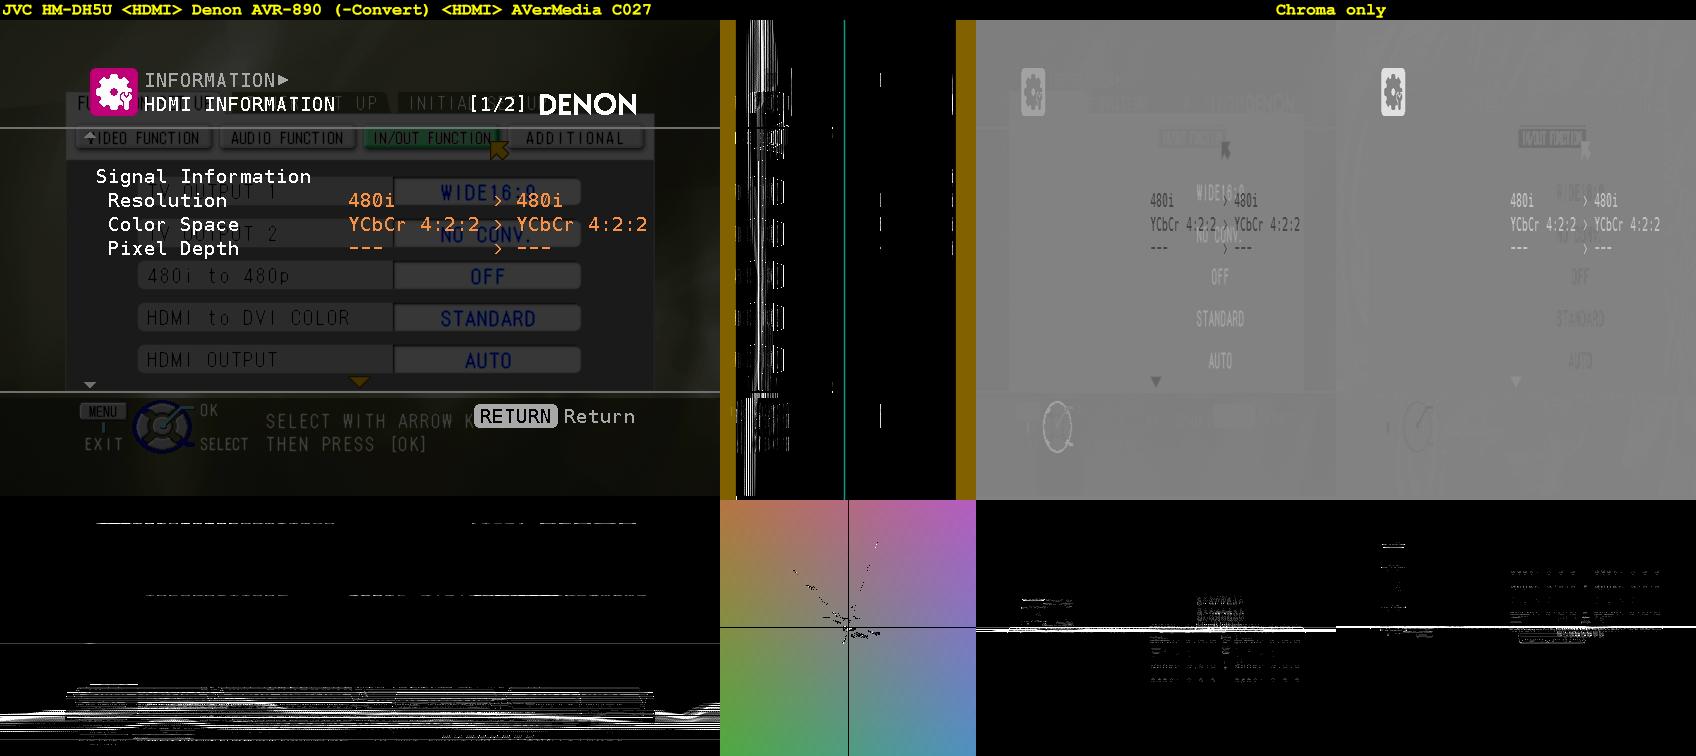 Click image for larger version  Name:Menu + Info - JVC HM-DH5U =HDMI= Denon AVR-890, -Convert =HDMI= AVerMedia C027.png Views:3875 Size:270.9 KB ID:35267